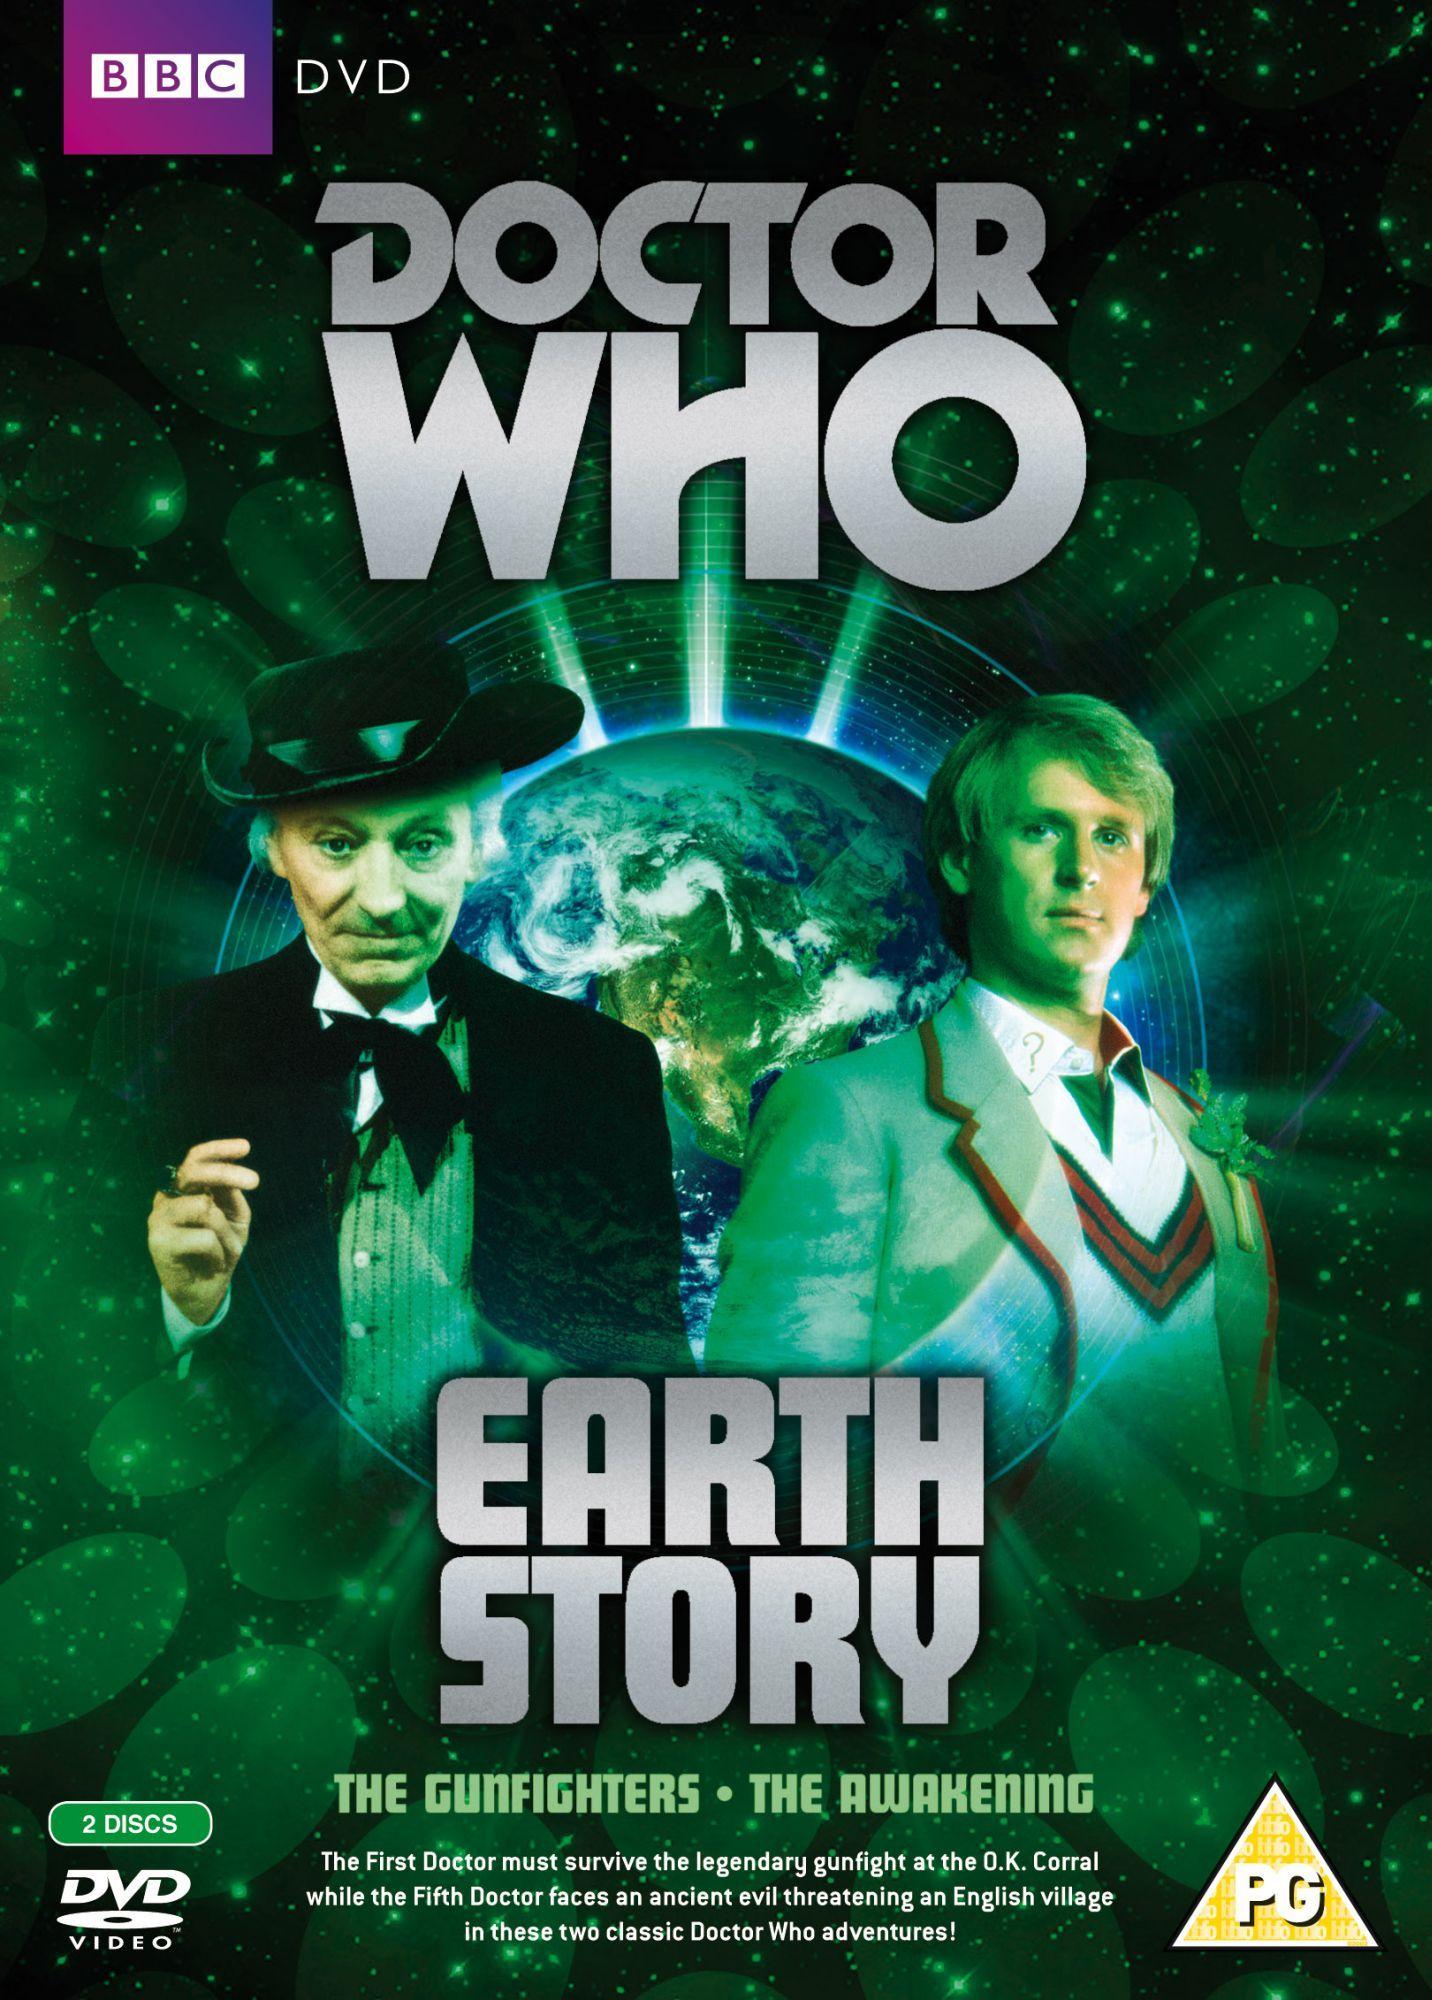 Earth story uk dvd